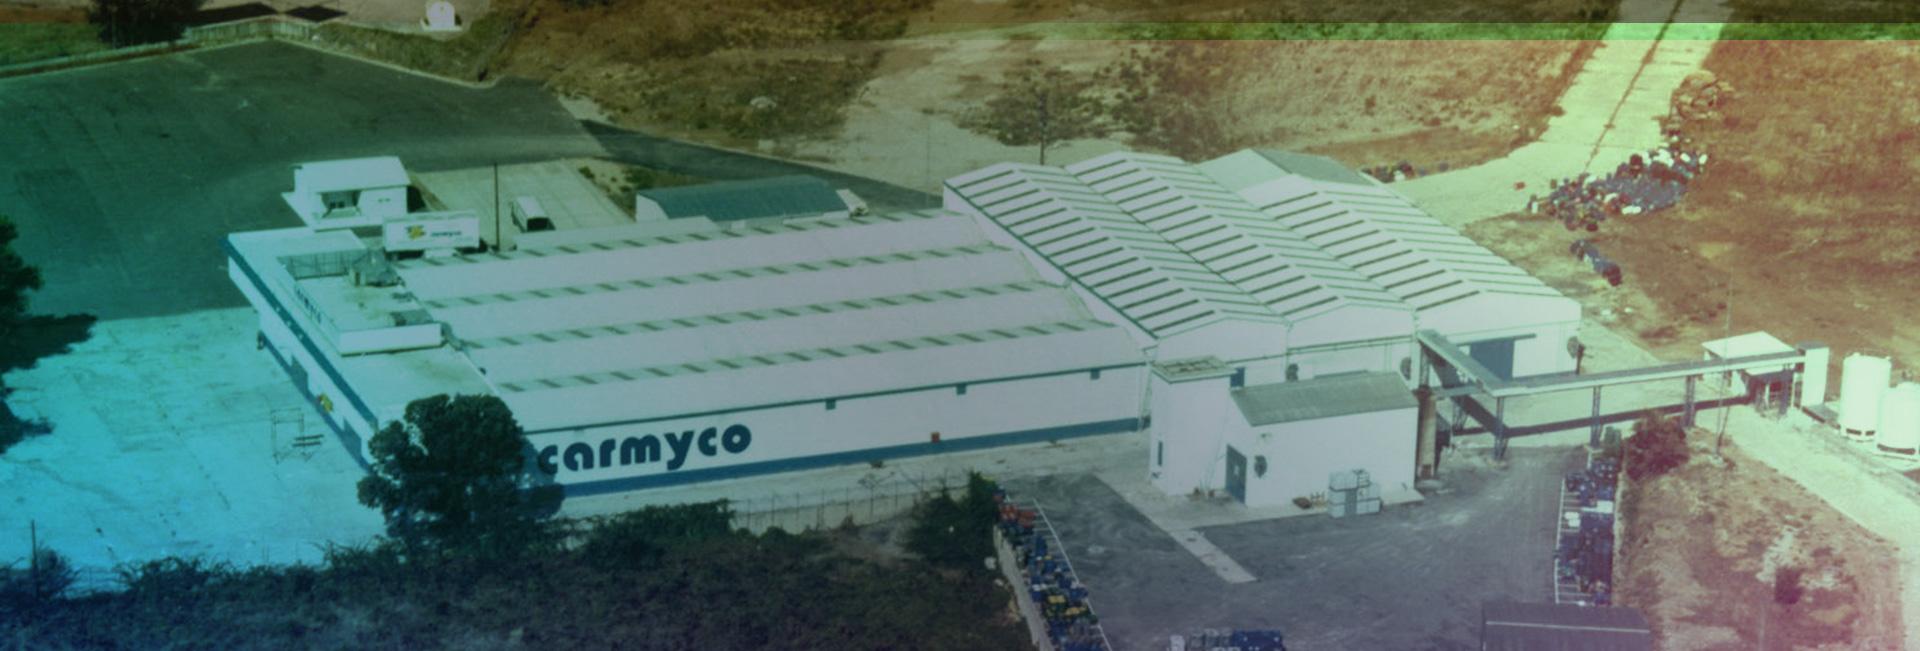 carmyco factory